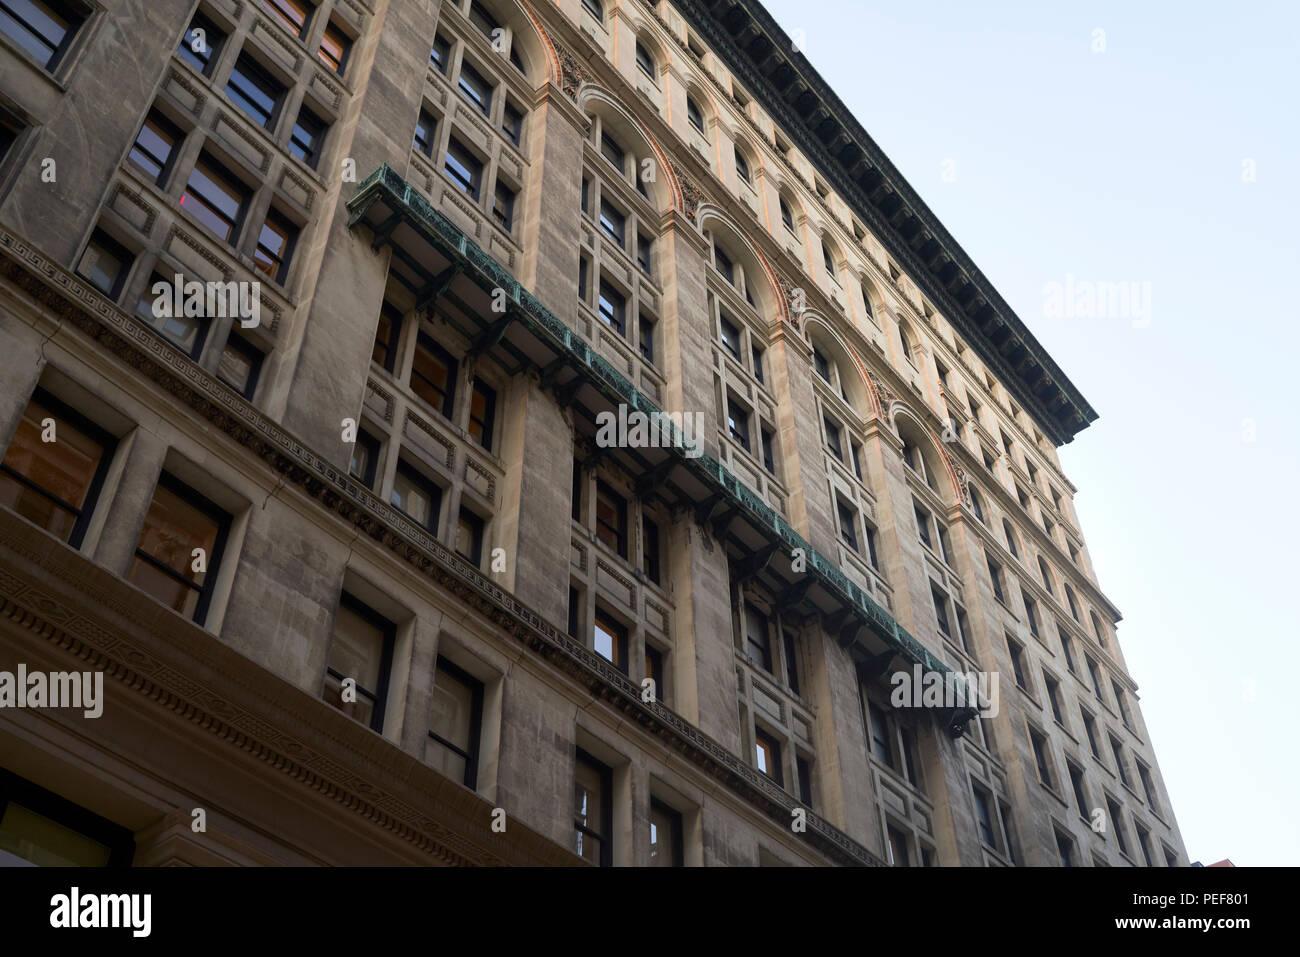 Facade of pre-war office building in New York City - Stock Image